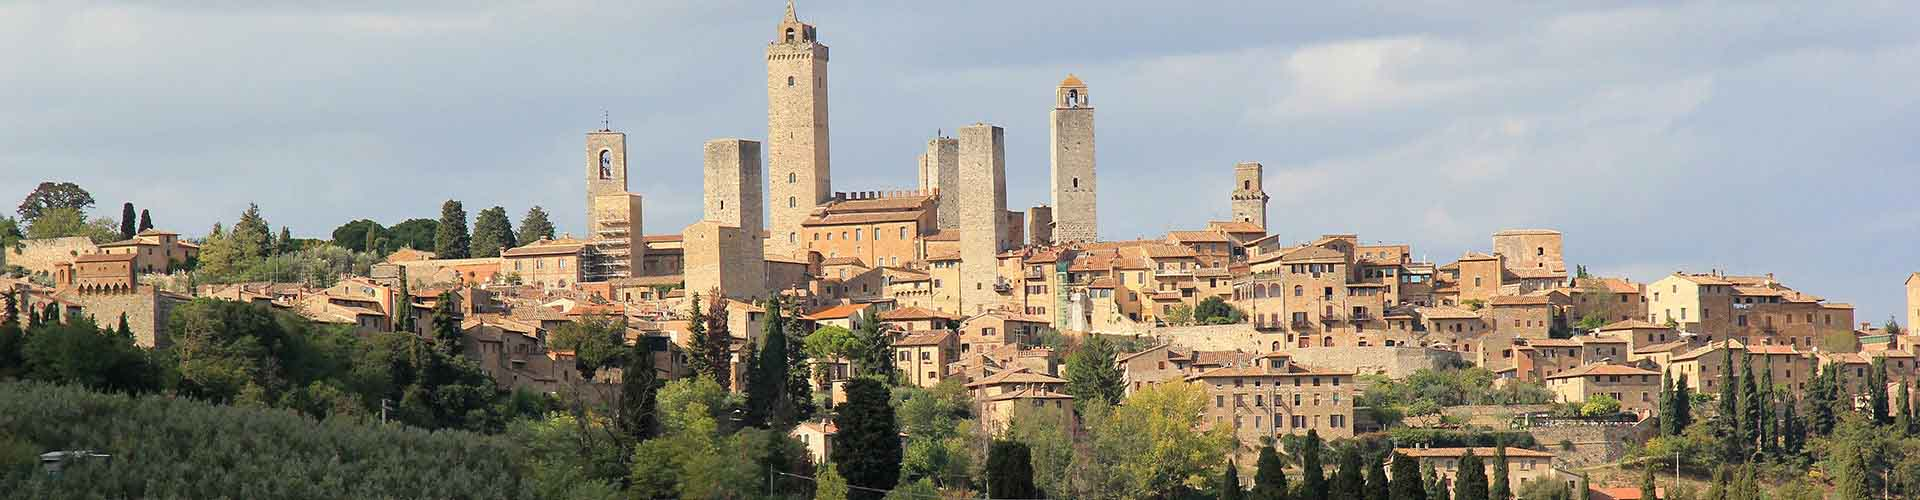 San Gimignano - Auberges de jeunesse à San Gimignano. Cartes pour San Gimignano, photos et commentaires pour chaque auberge de jeunesse à San Gimignano.